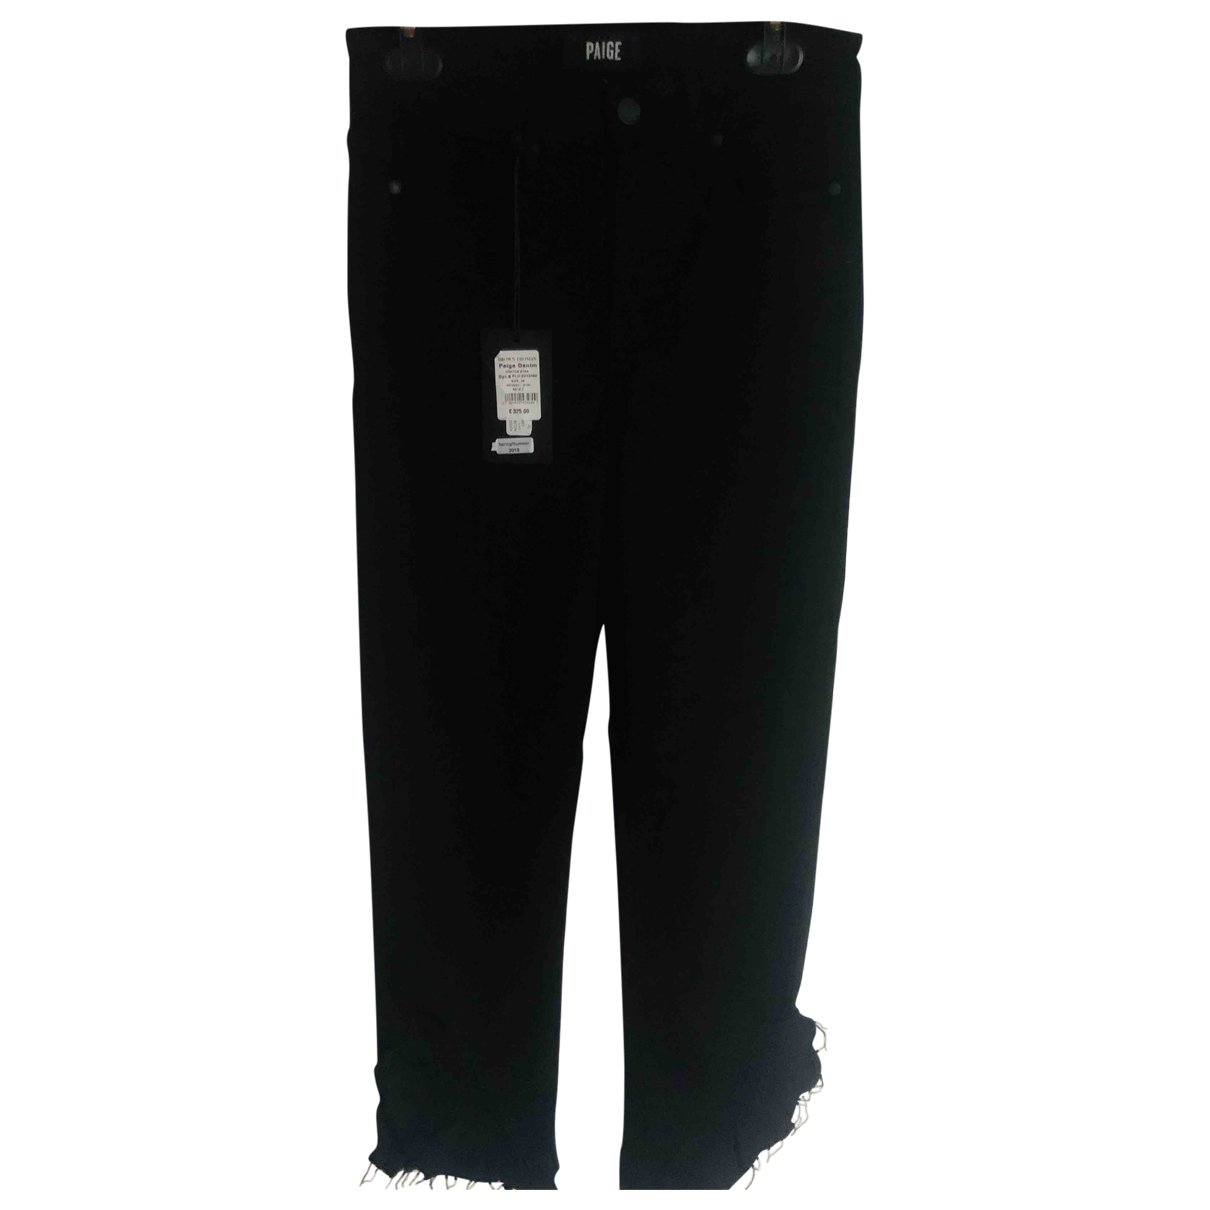 Paige Jeans \N Black Cotton - elasthane Jeans for Women 26 US